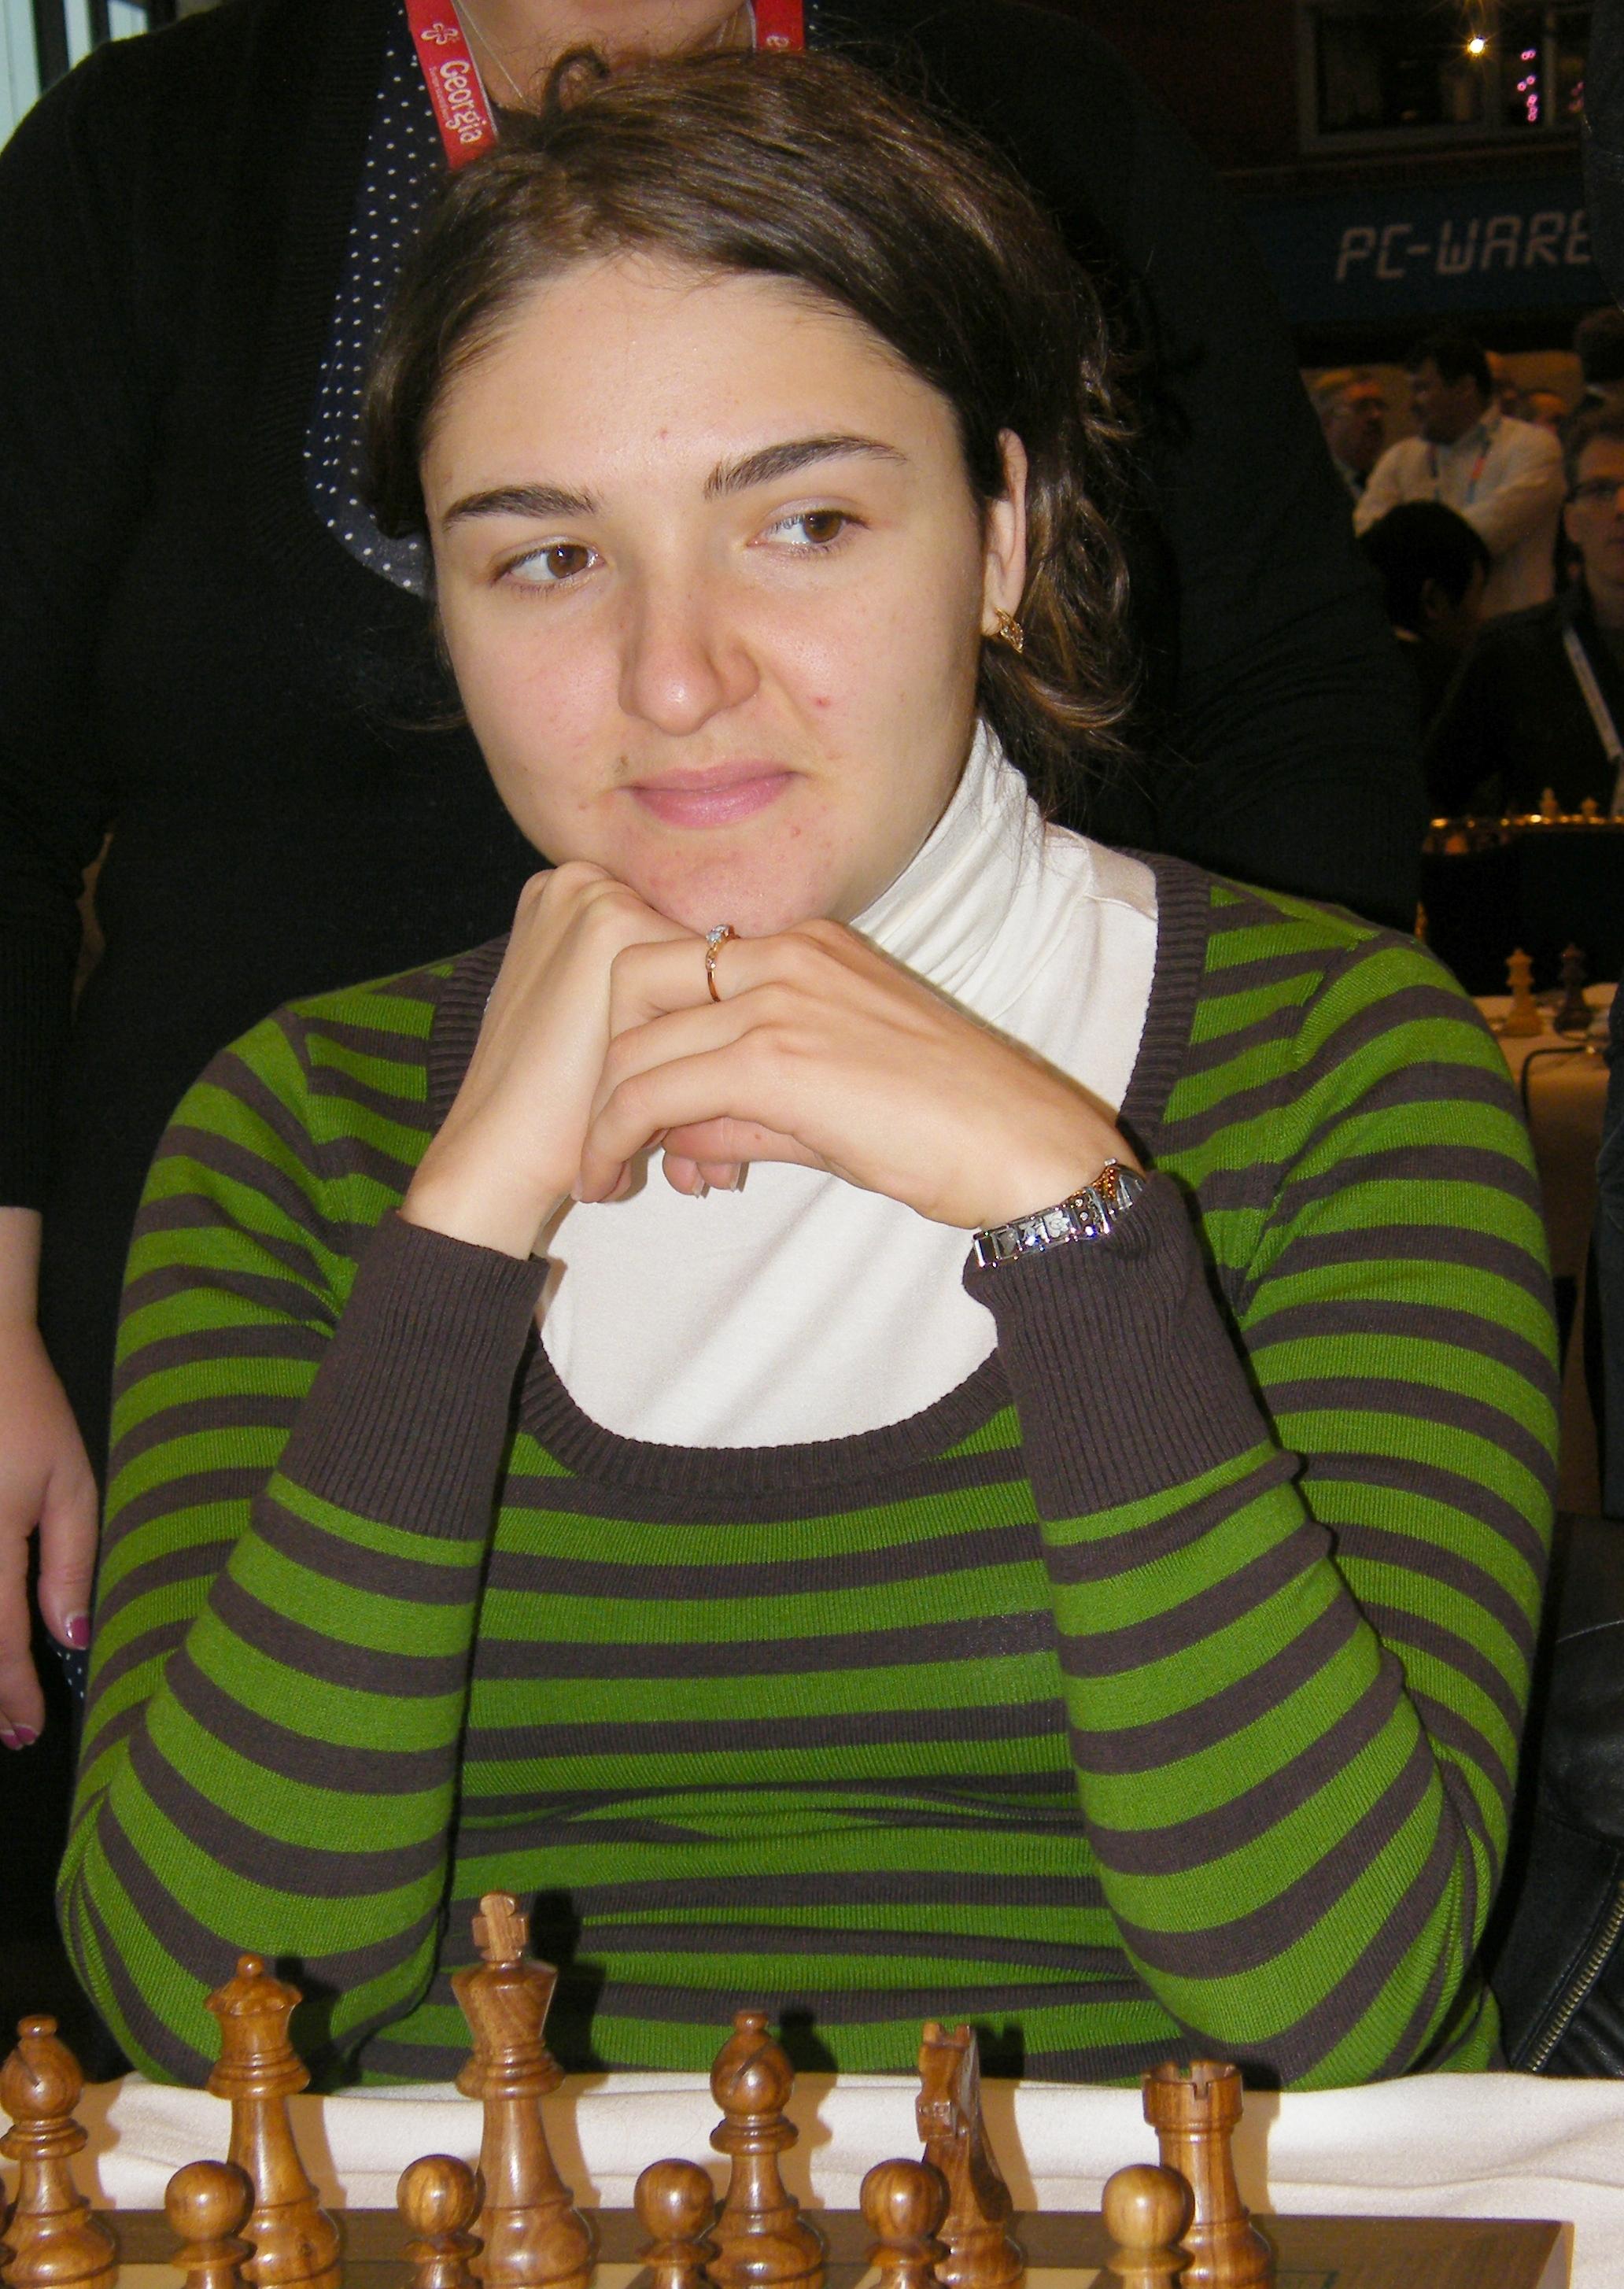 File:Dzagnidze nana 20081119 olympiade dresden.jpg ...  Julia Sarwer